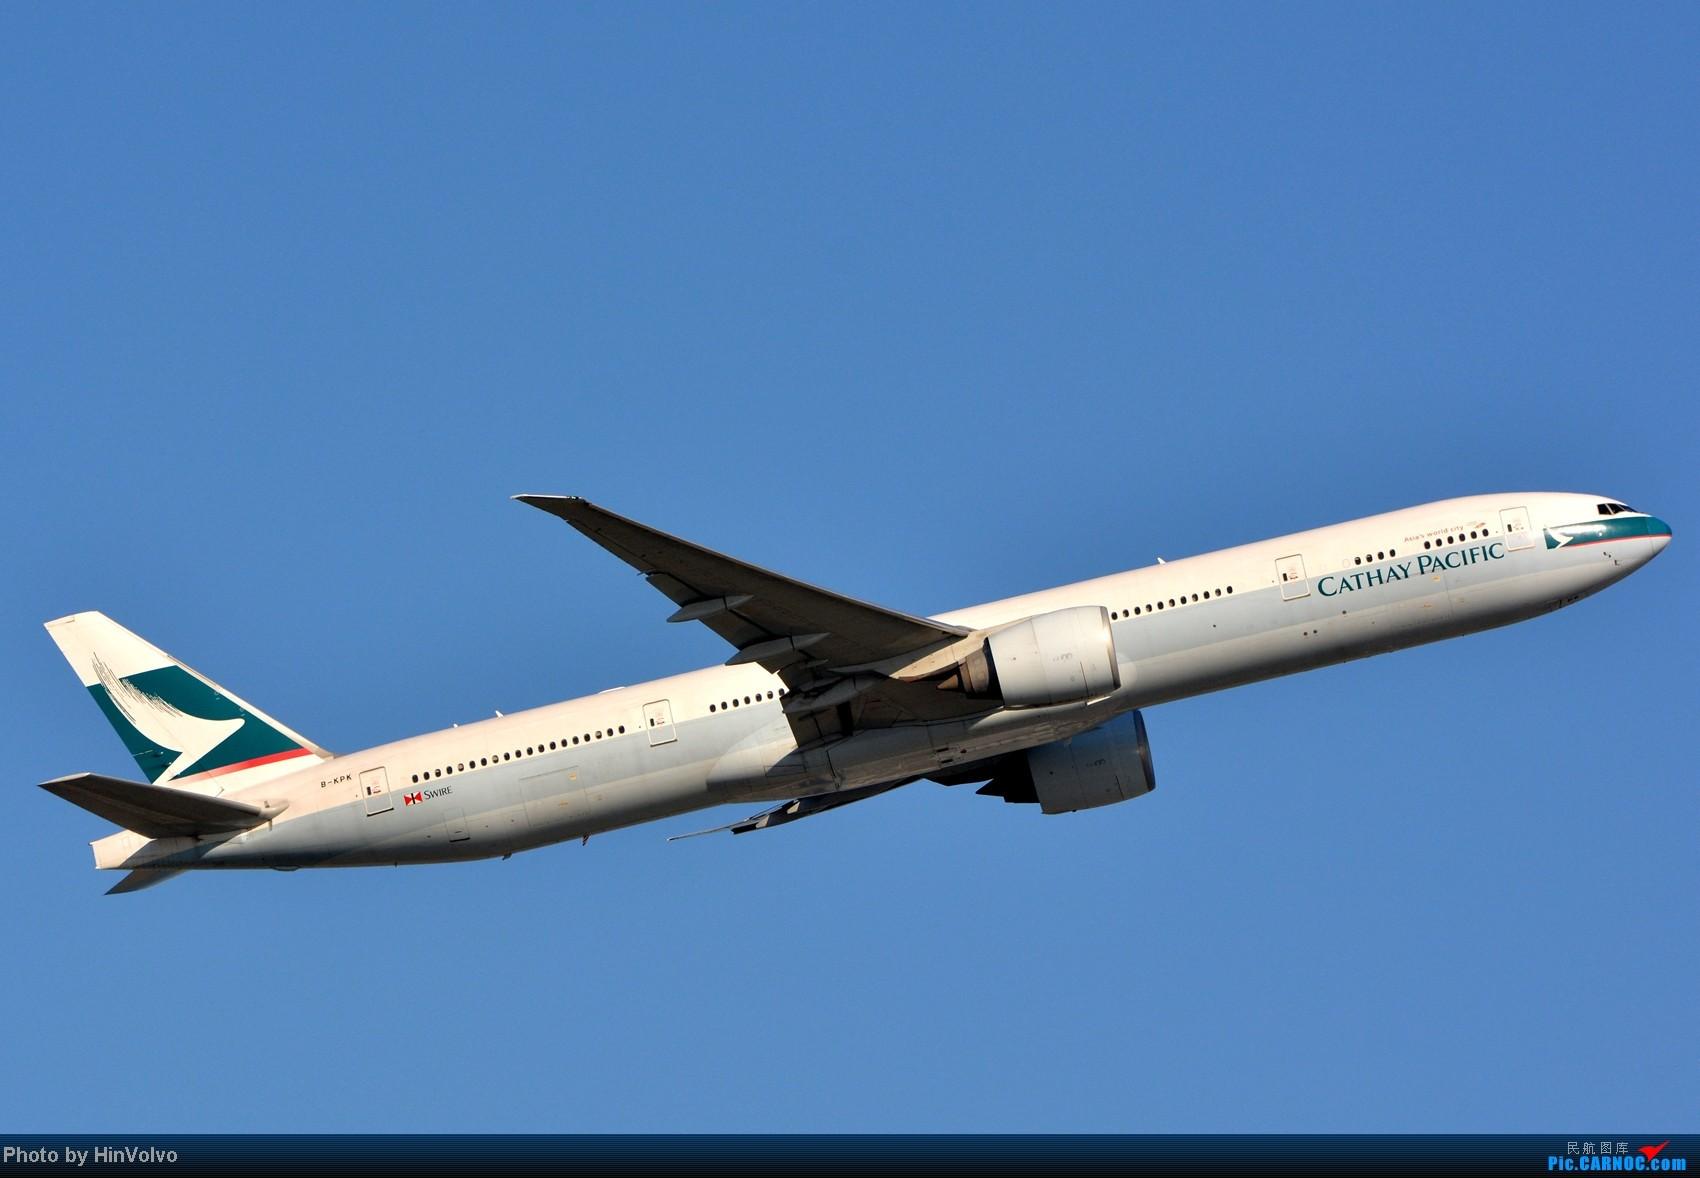 Re:[原创]~~~~多圖系列~~~HKG,早上好!寒冷的天氣出發前往機場拍到中午。 BOEING 777-300 B-KPK 中国香港赤鱲角机场